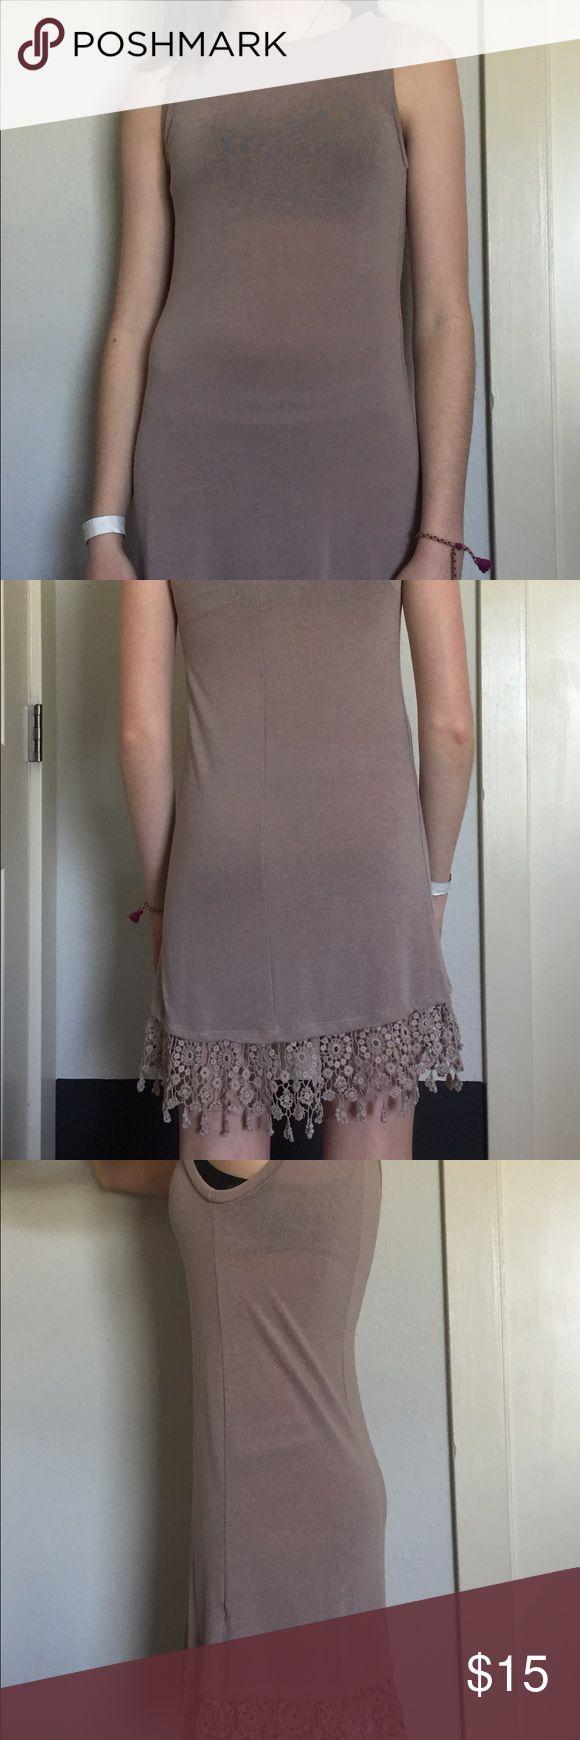 Beige summer dress Being light weight summer dress with flower pattern fat the bottom Charlotte Russe Dresses High Low